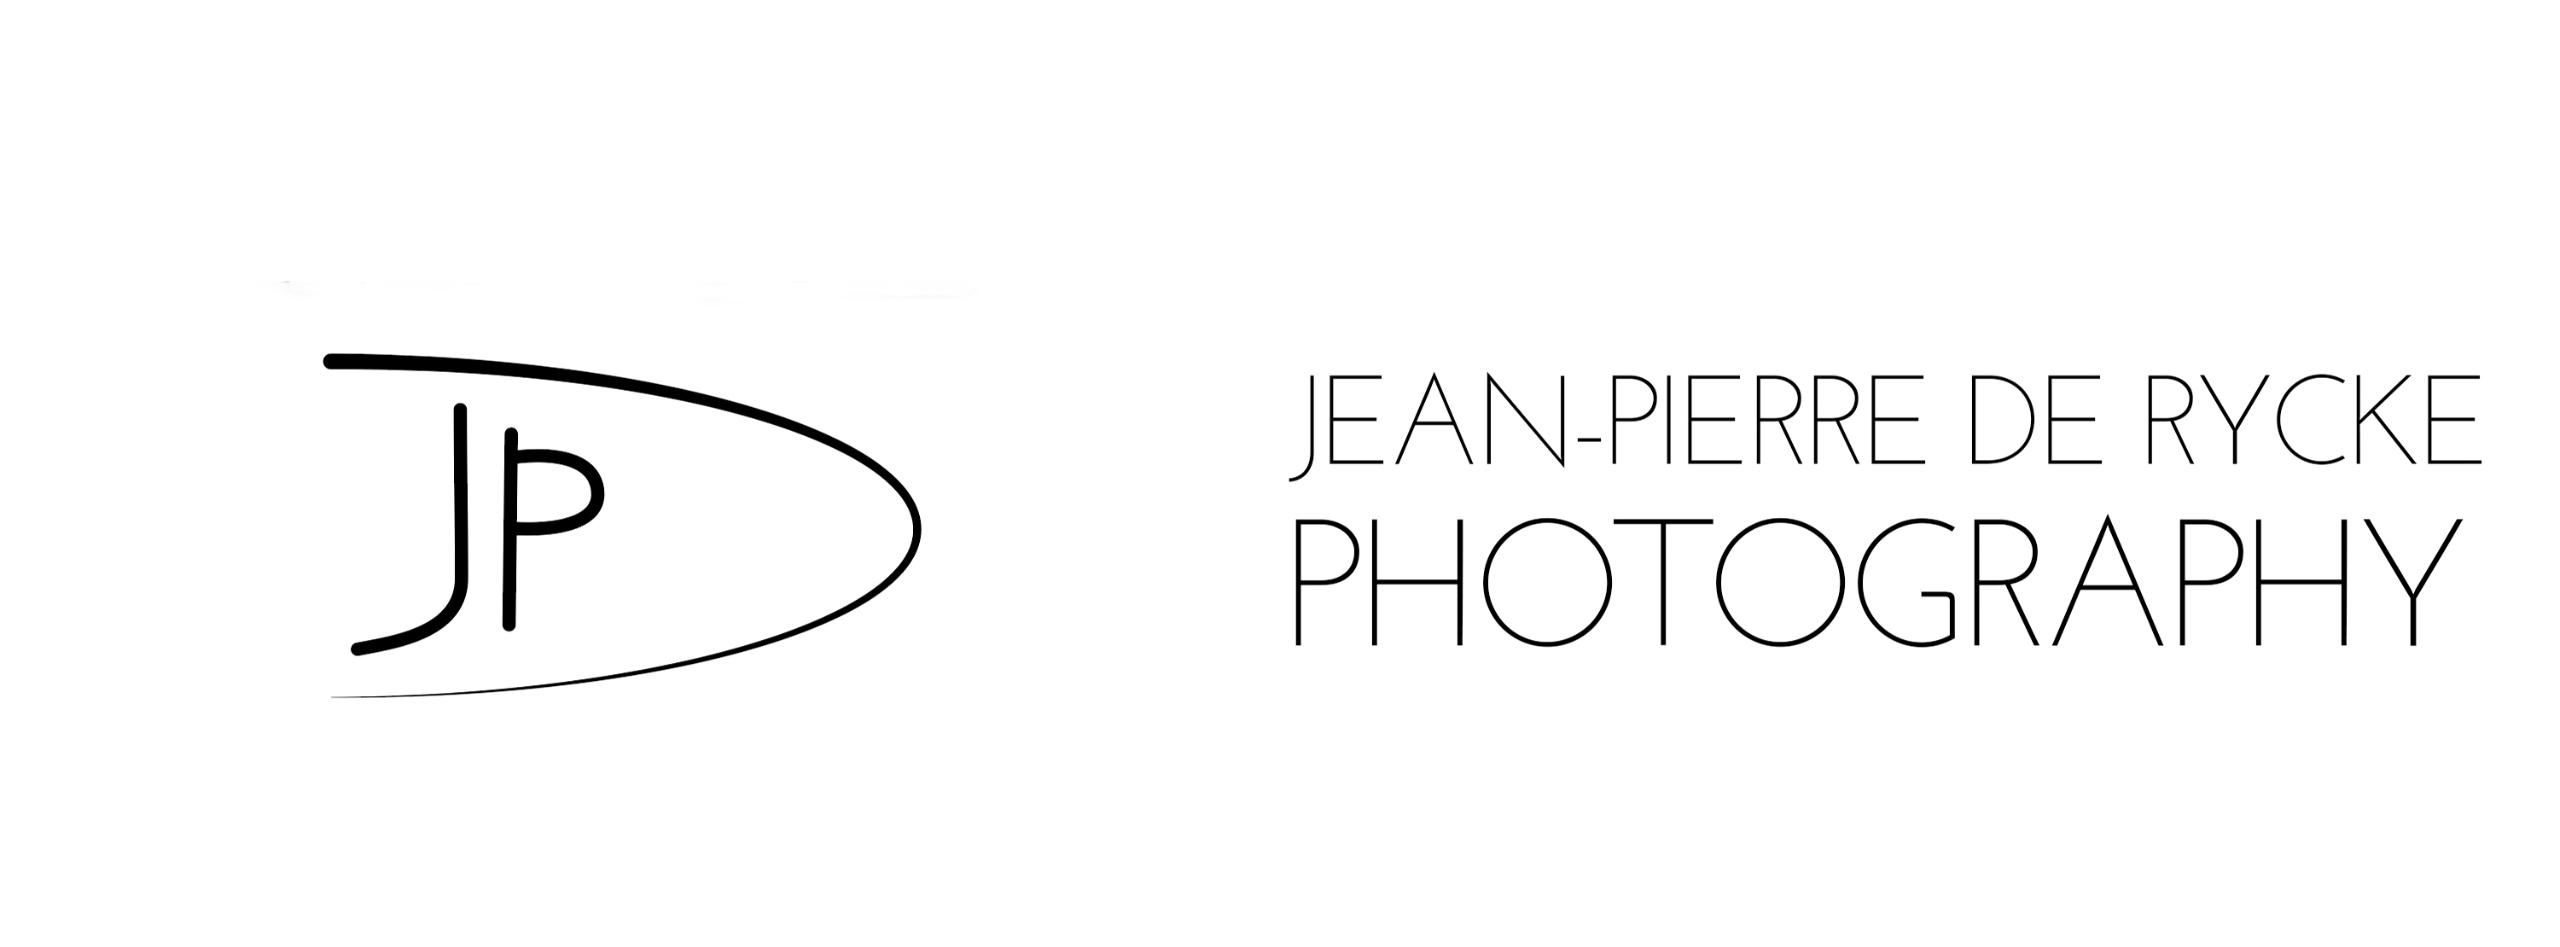 jean-pierre De Rycke (@jpderycke) Cover Image